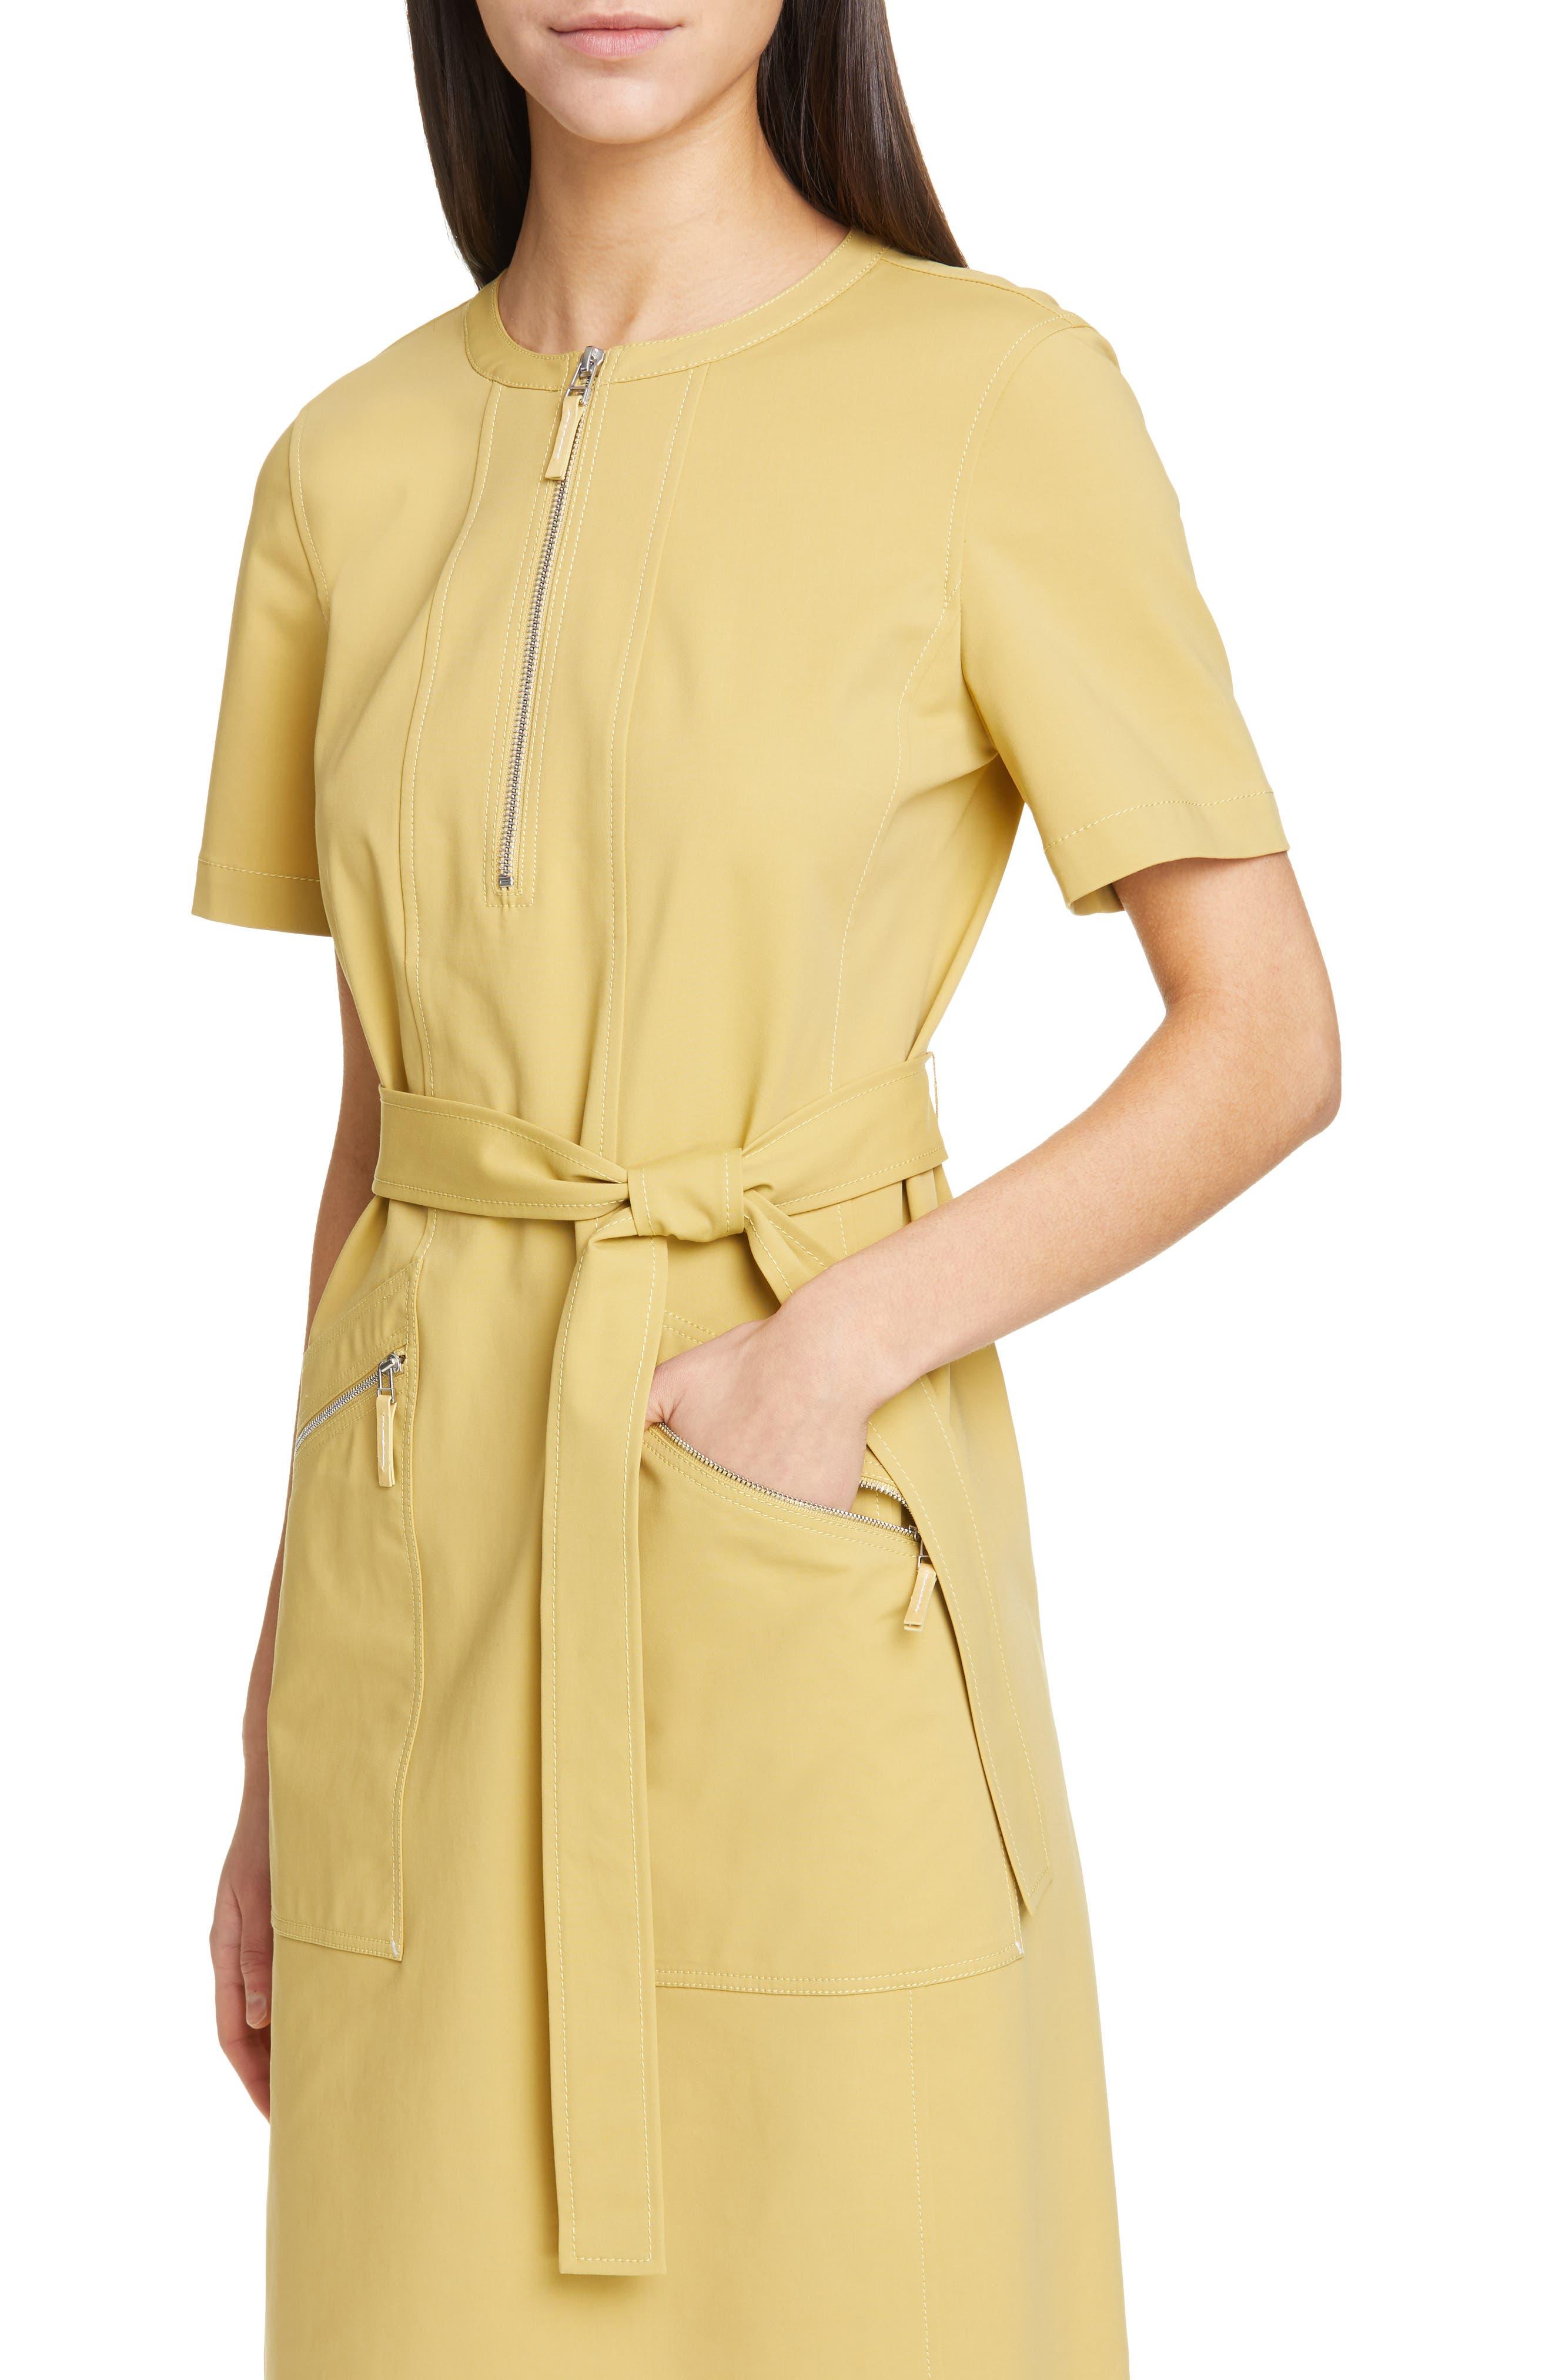 LAFAYETTE 148 NEW YORK, Elizabella Belted Dress, Alternate thumbnail 6, color, GREEN TEA